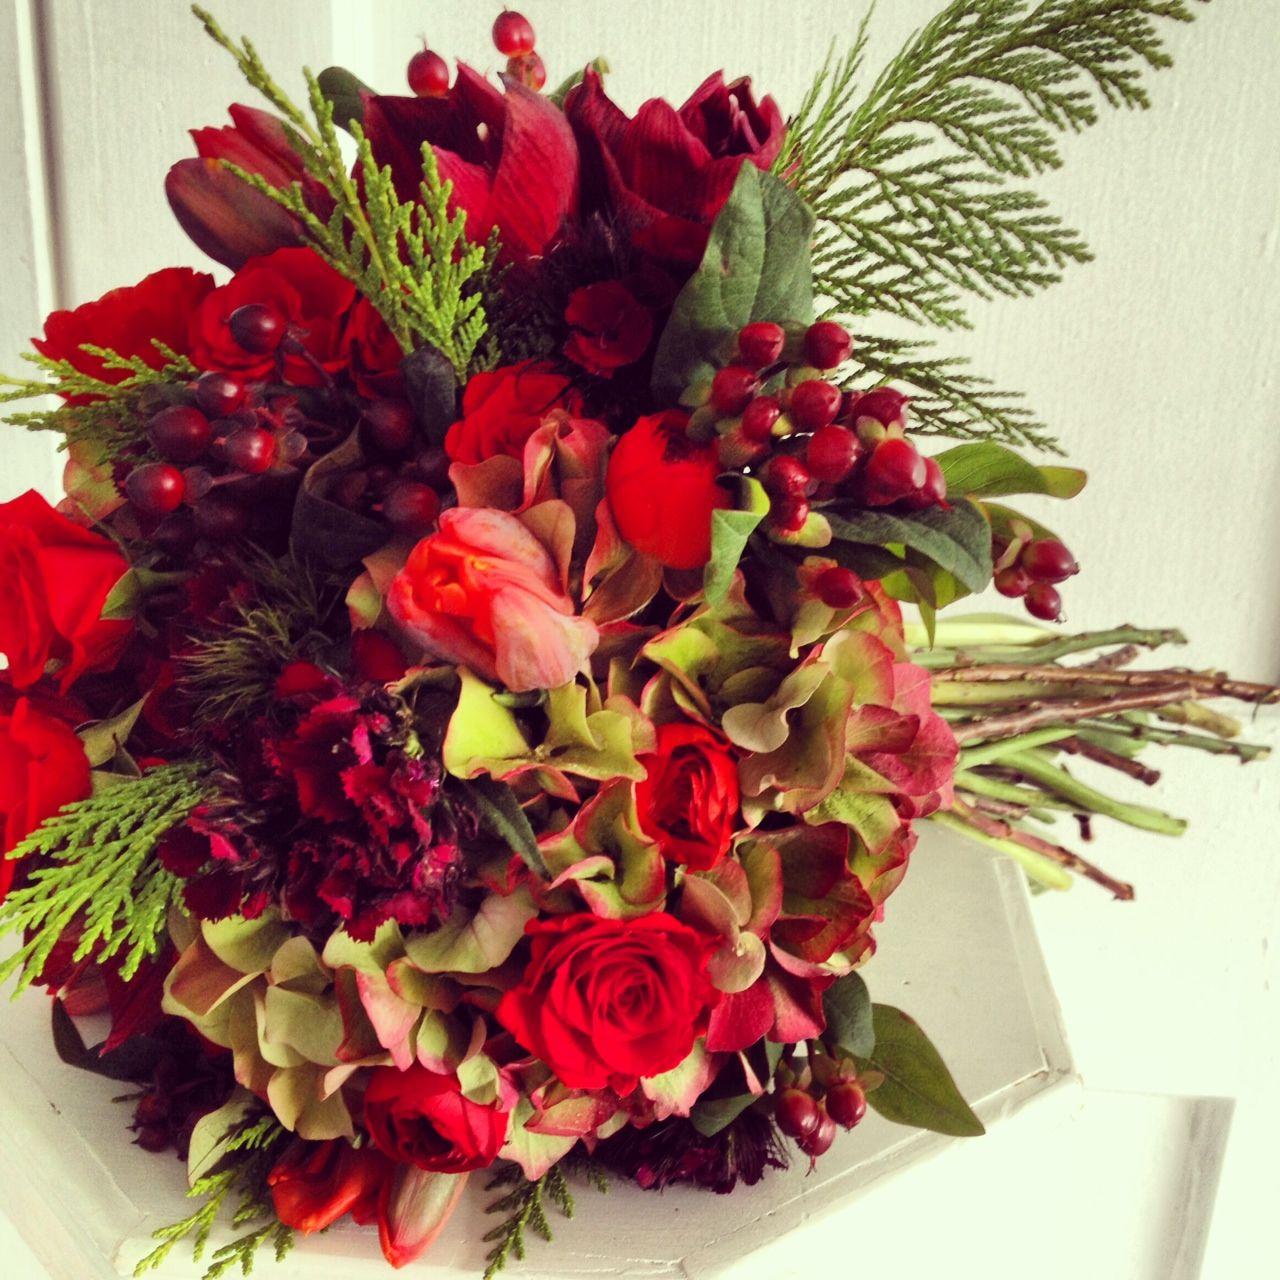 Azalea Floral Design Unique Flowers For Ct Weddings And Events Winter Bridal Bouquets Winter Wedding Bouquet Classic Wedding Bouquet